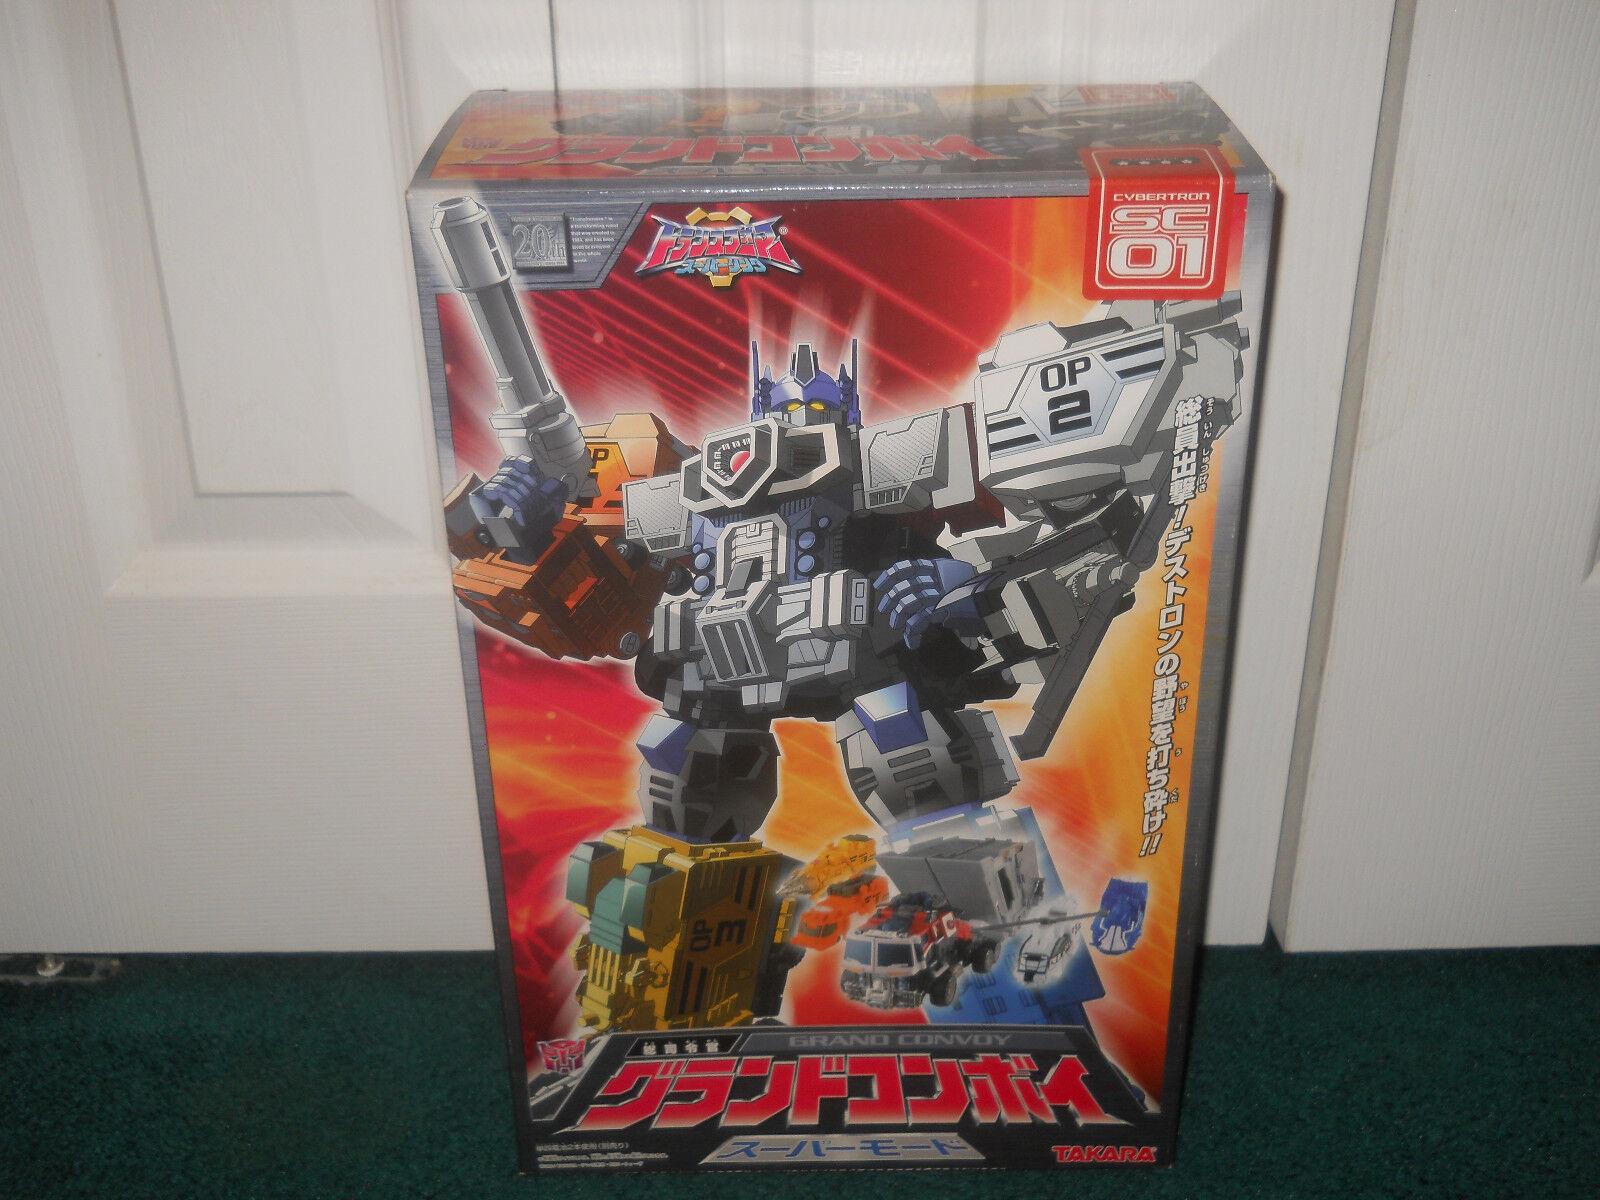 Grand Convoy Sc-01 Cybertron Super enlace Transformers Takara PSIM